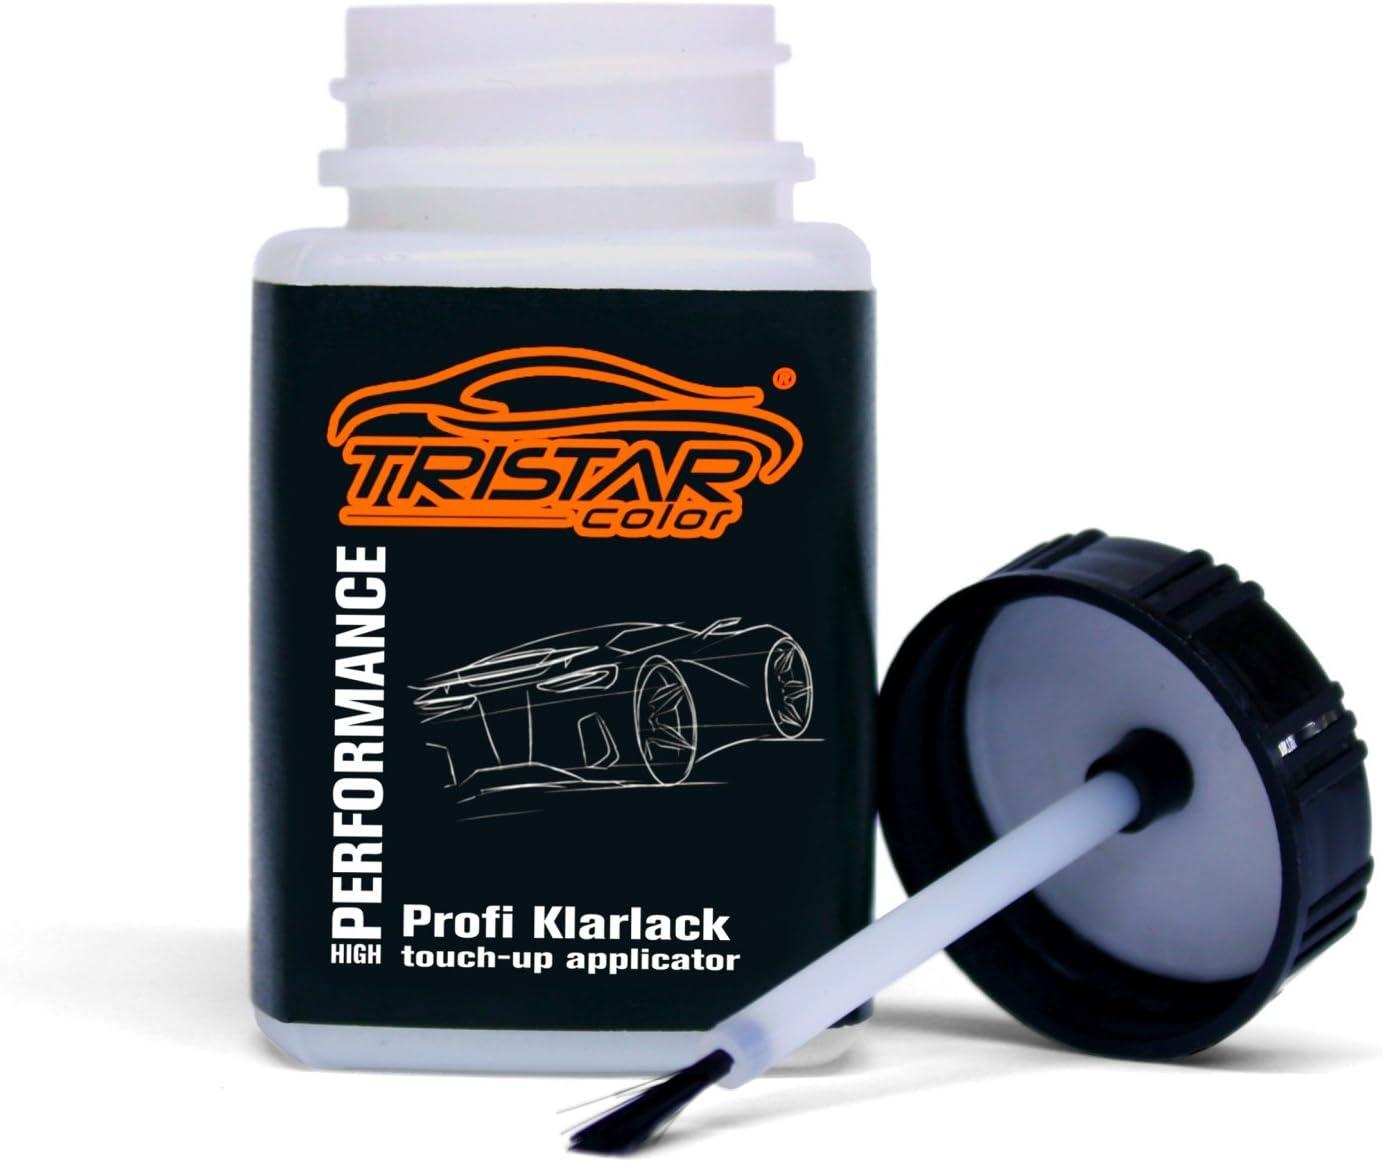 Tristarcolor Autolack Lackstift Set Für Seat Ls9r Blanco Nevada Perl Basislack Klarlack Je 50ml Auto